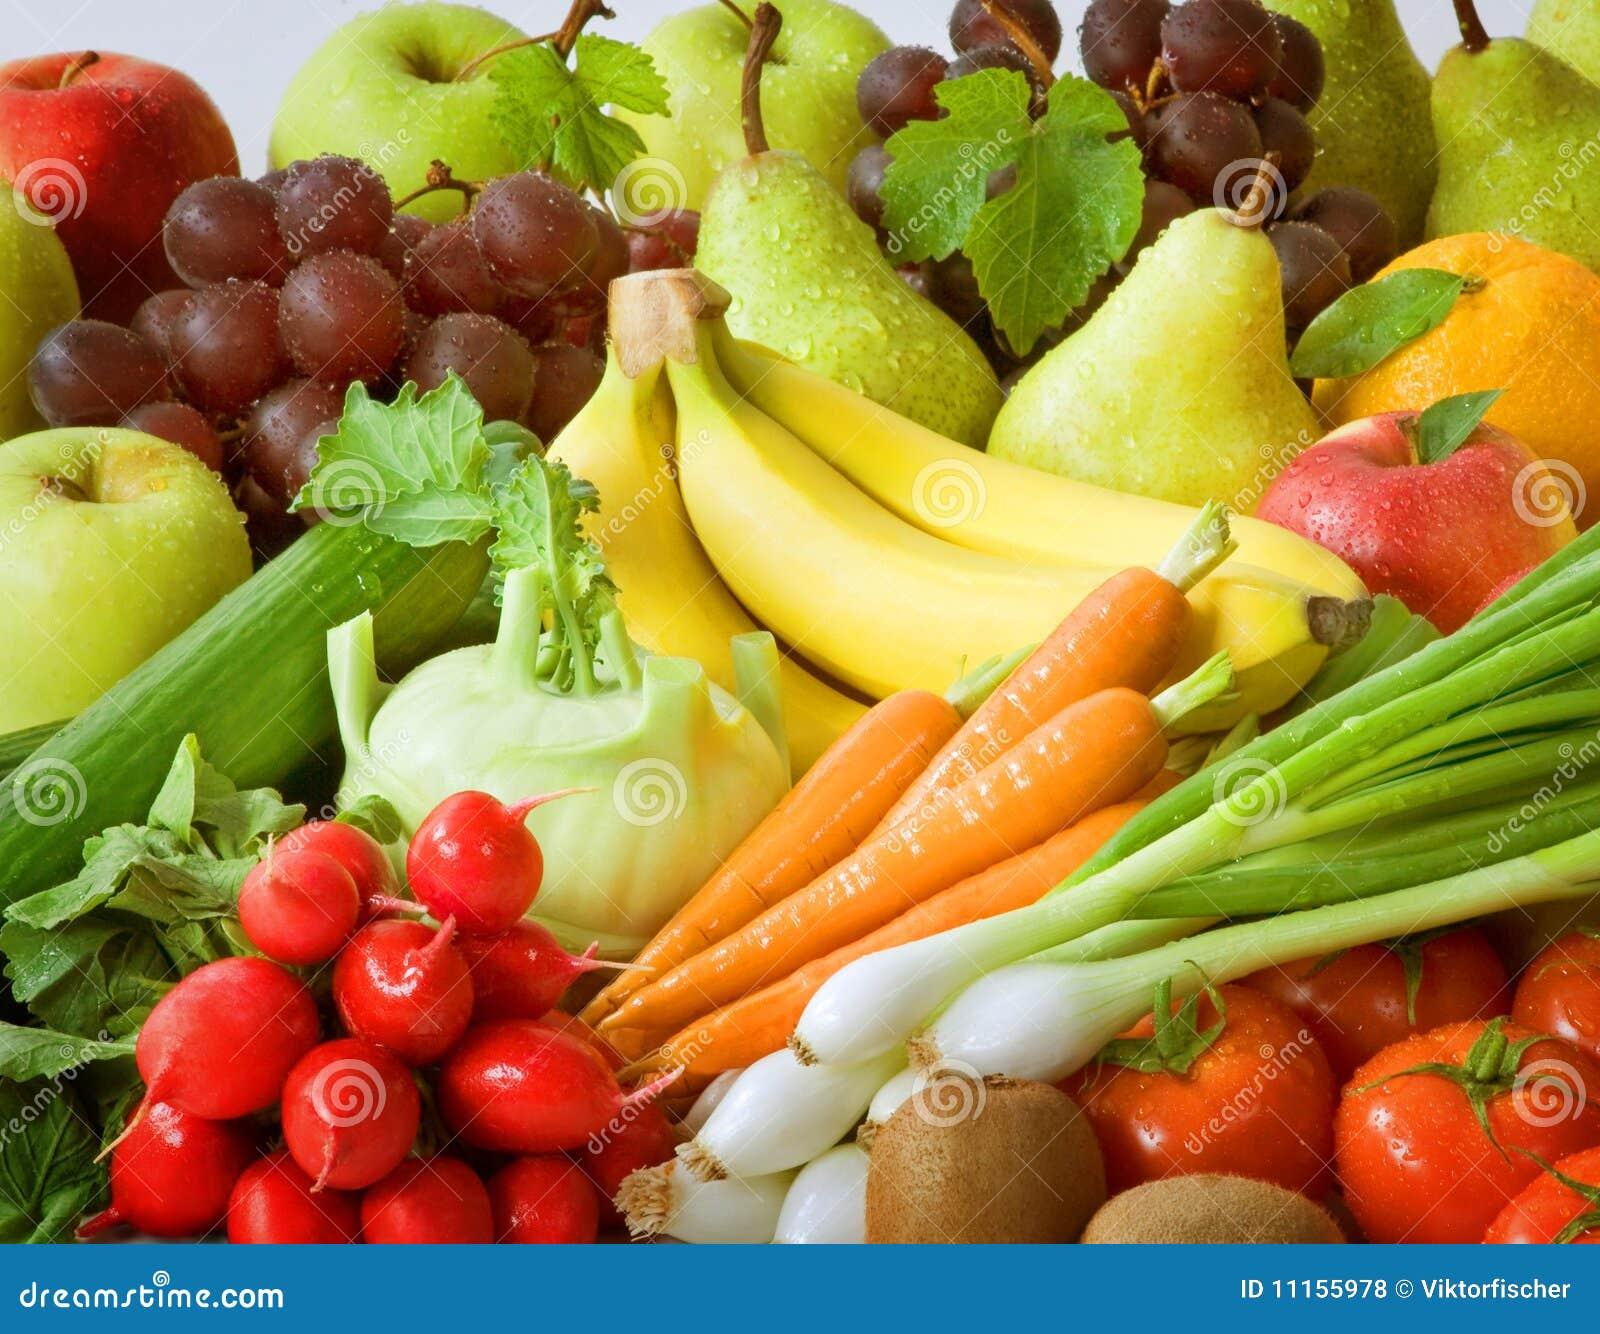 1a71e3f757de Verduras frescas y fruta foto de archivo. Imagen de greengrocer ...